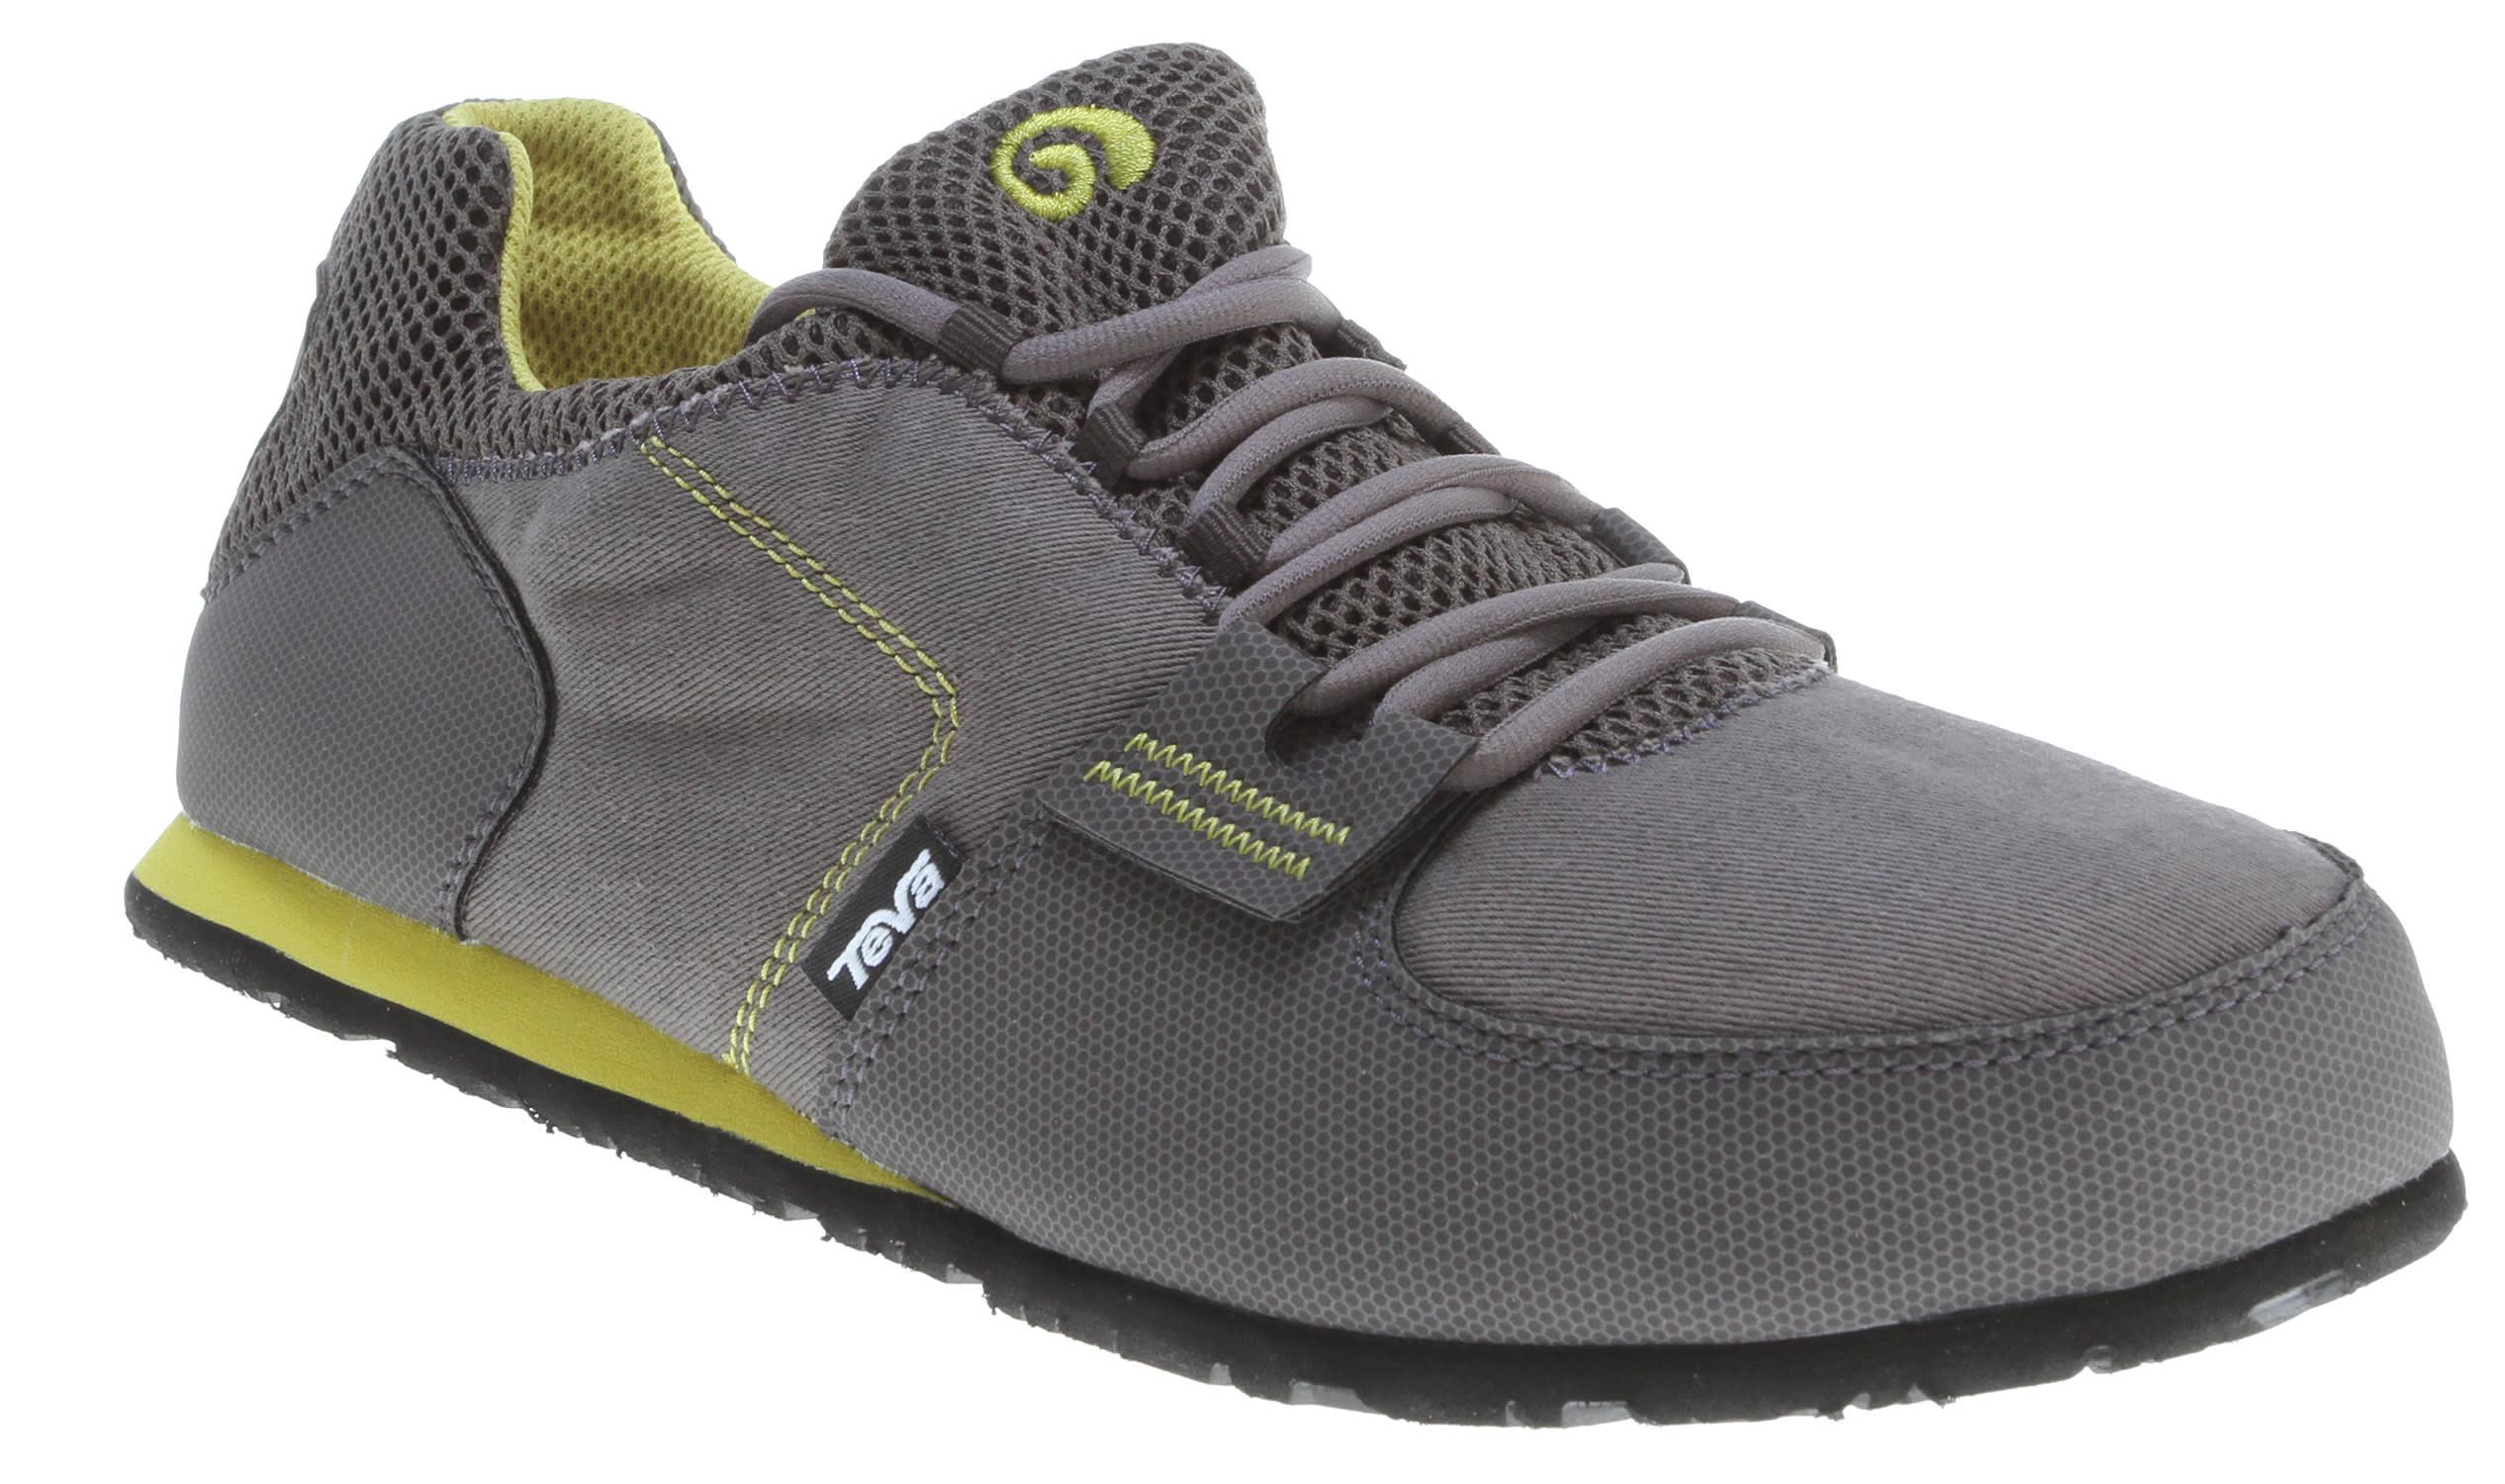 33c92a4324a6 Teva Mush Frio Lace Canvas Shoes - thumbnail 2